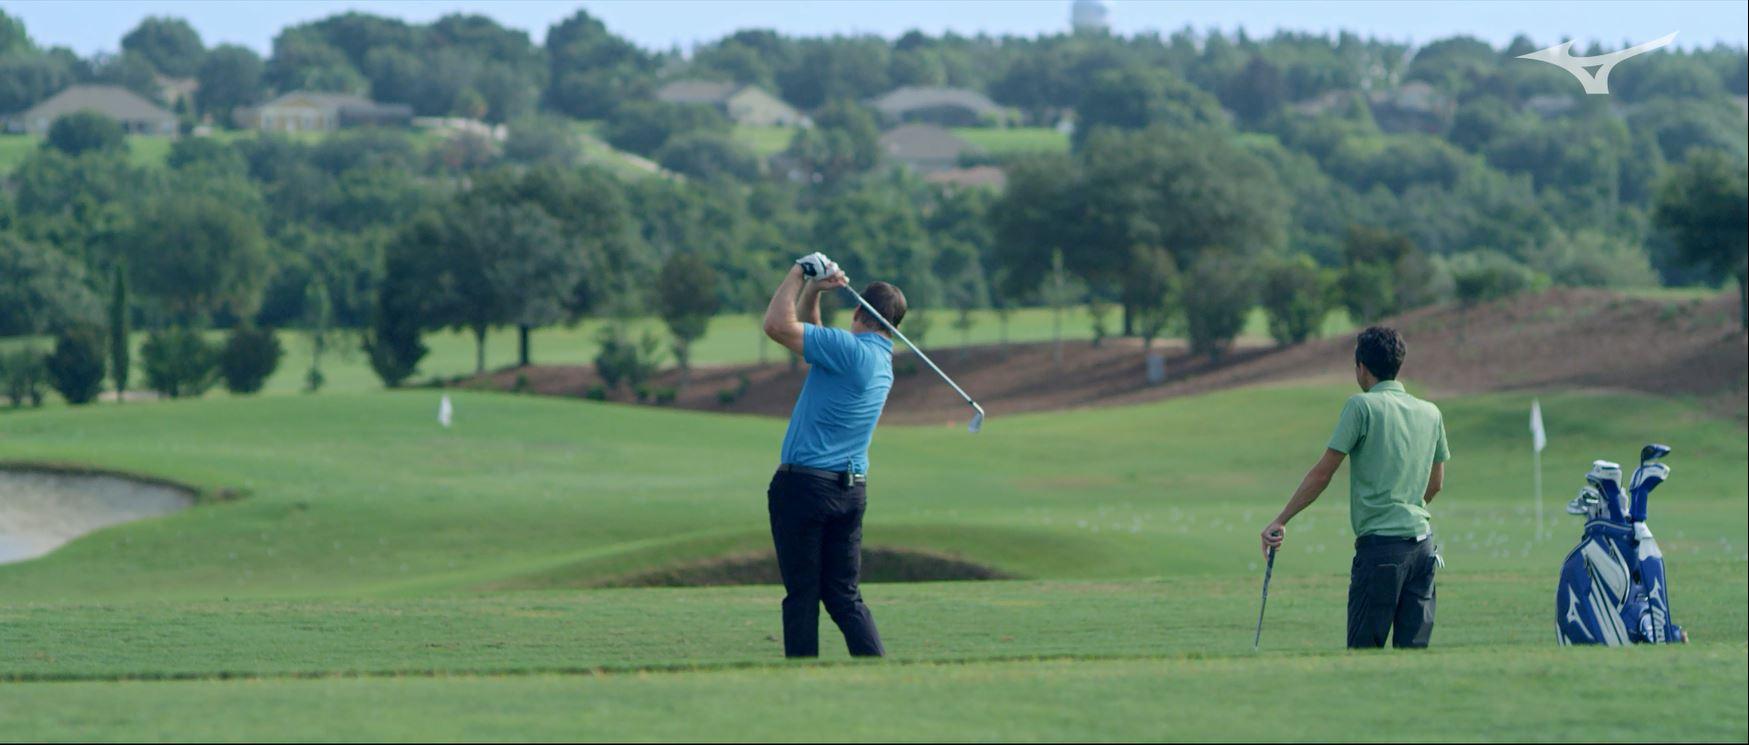 mizuno golf wallpaper image - photo #45